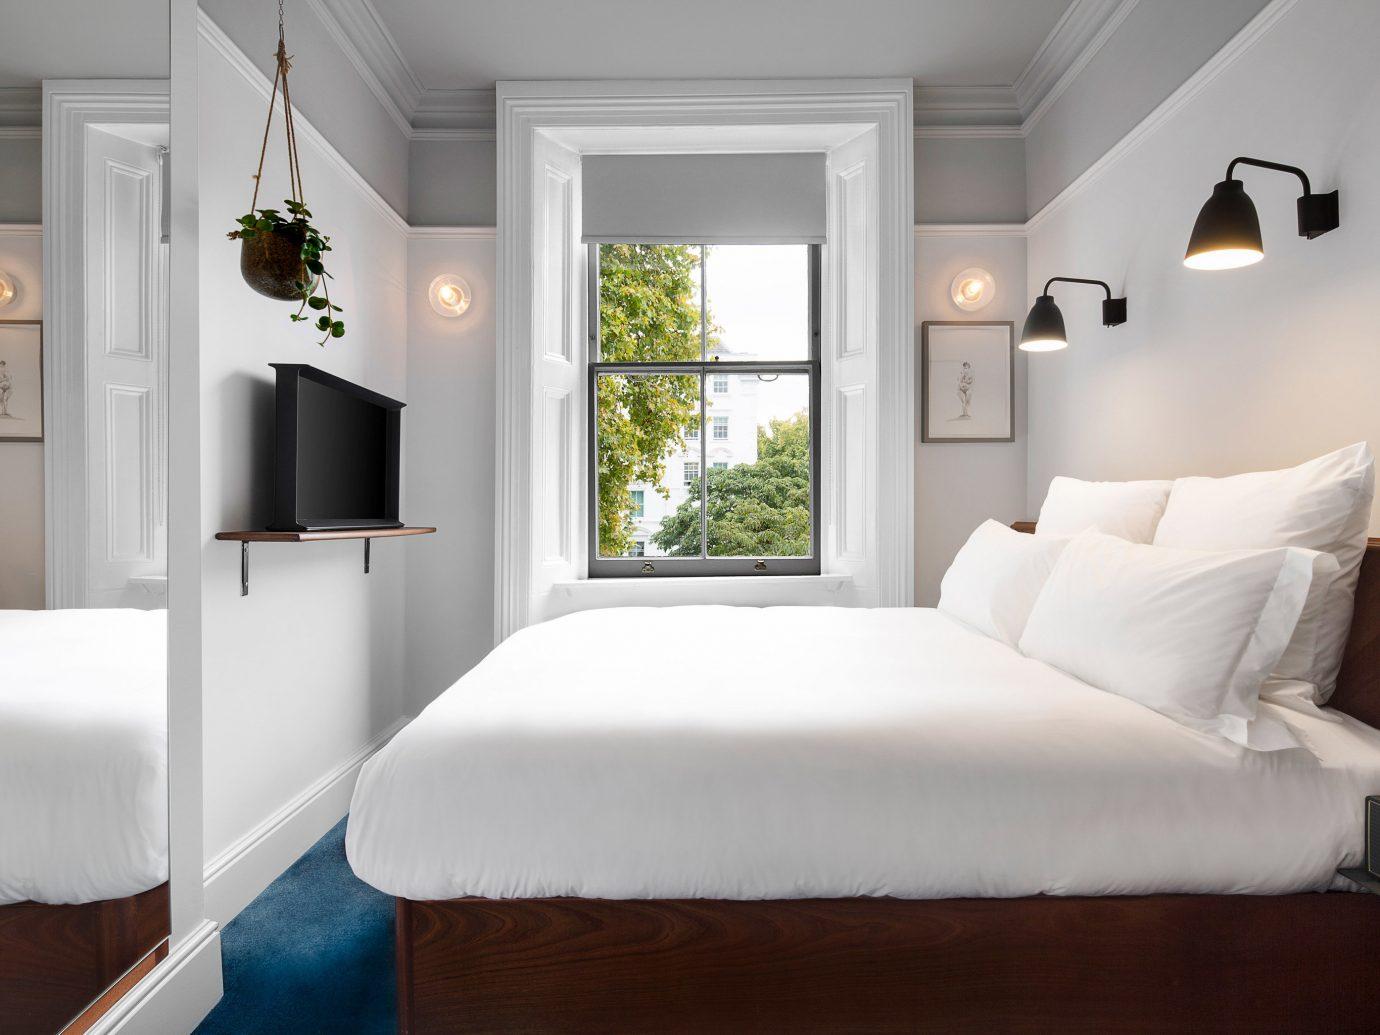 indoor wall sofa bed floor room Bedroom bed frame window interior design Suite home ceiling white furniture real estate hotel estate comfort mattress daylighting bed sheet decorated